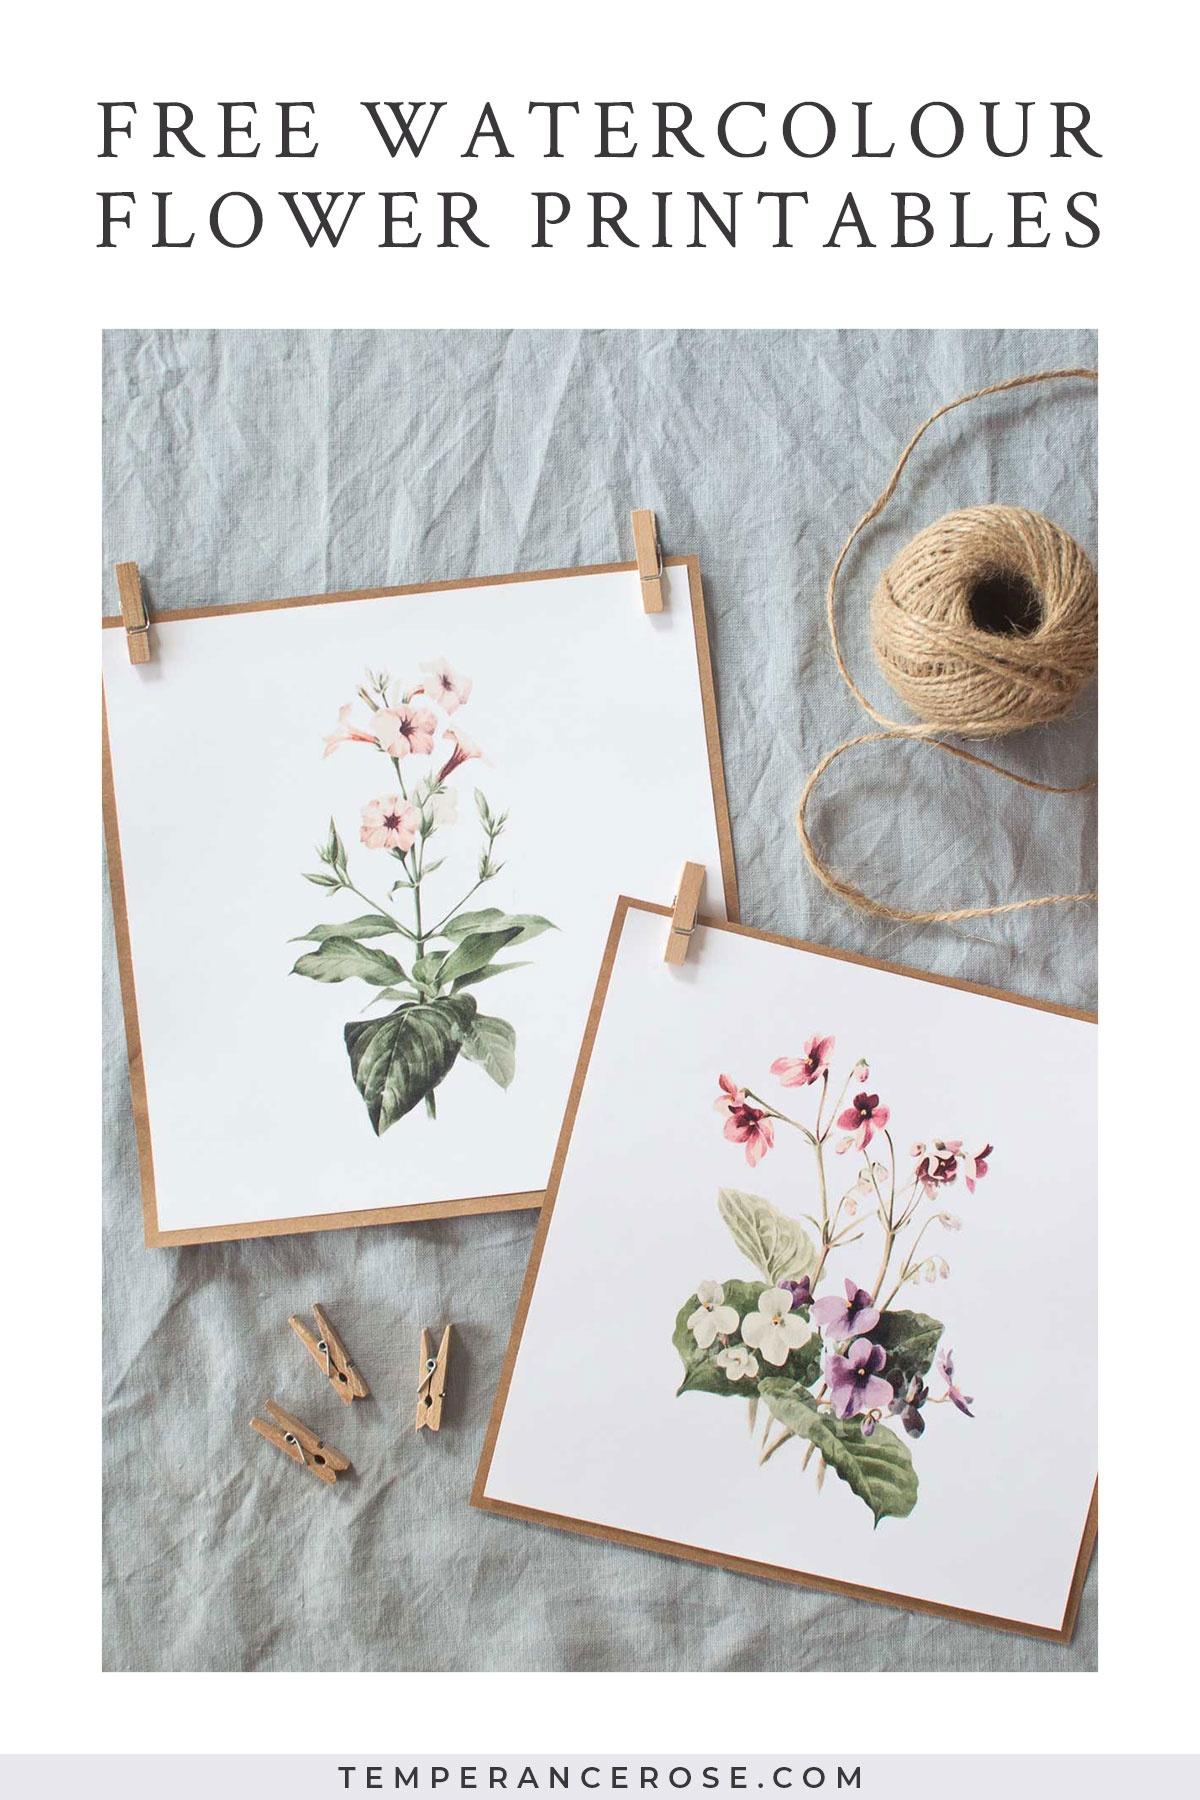 2 Free Watercolour Flower Printables - Floral Printables Free